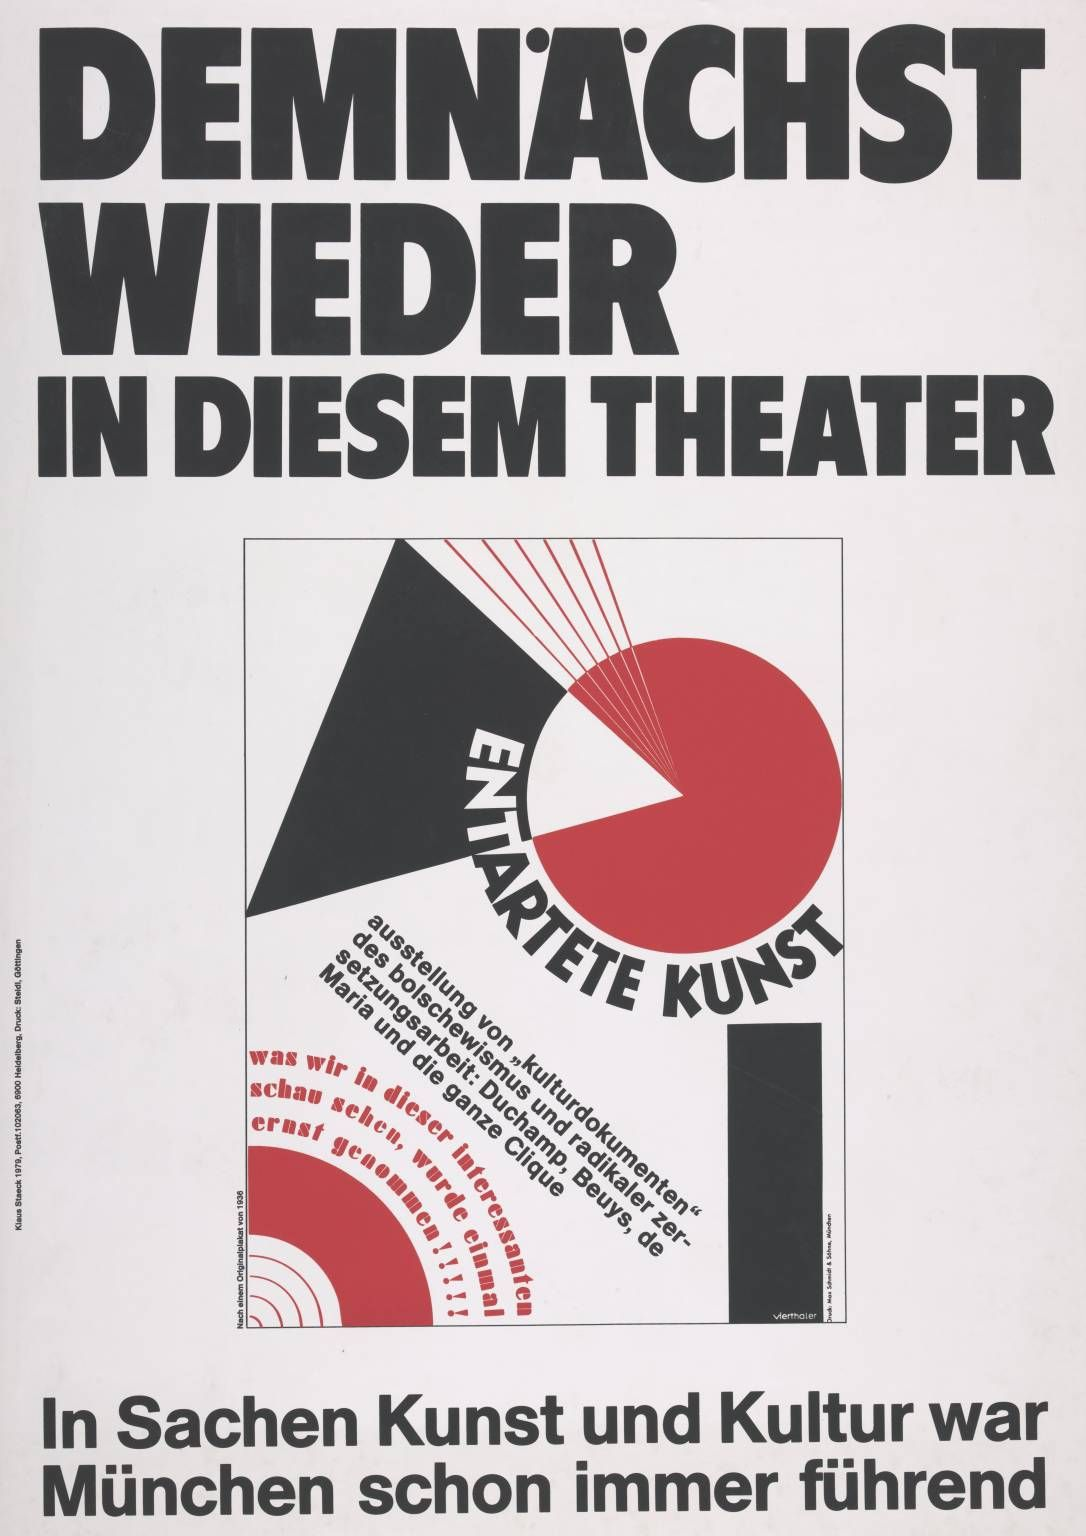 'Entartete Kunst', Joseph Beuys | Tate | Exhibitions ...